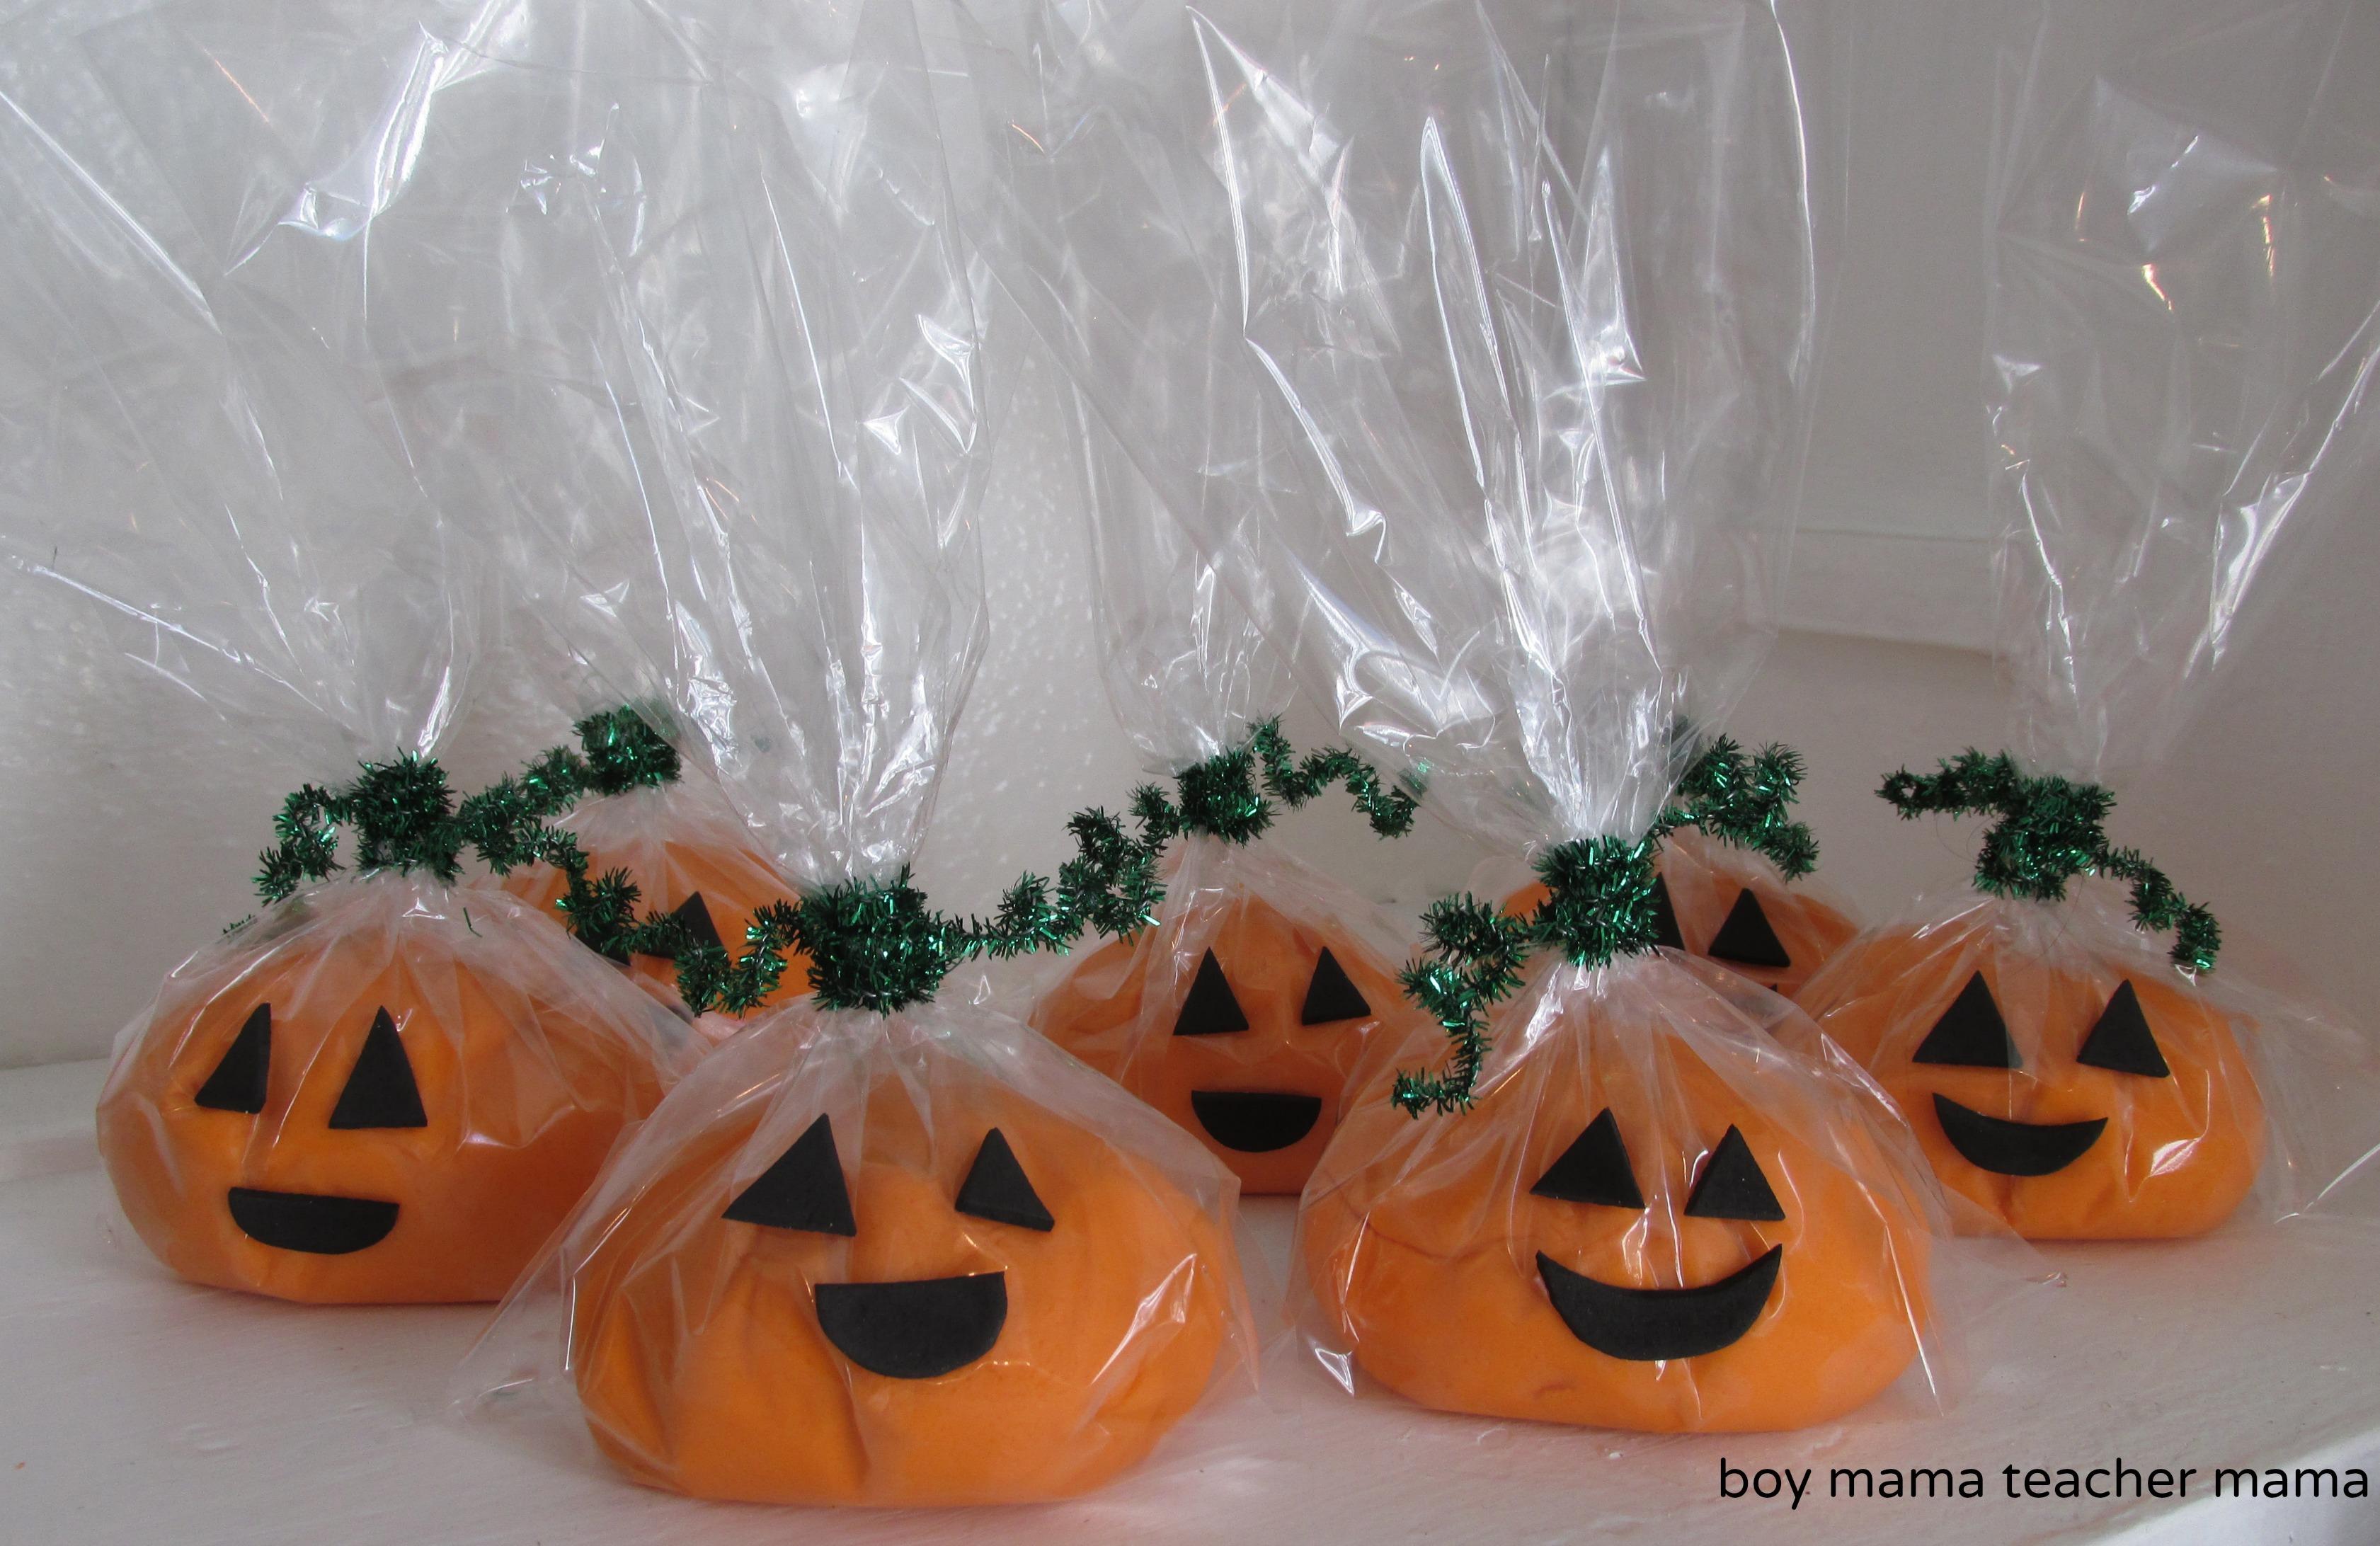 boy mama: play dough pumpkin face goodie bags - boy mama teacher mama